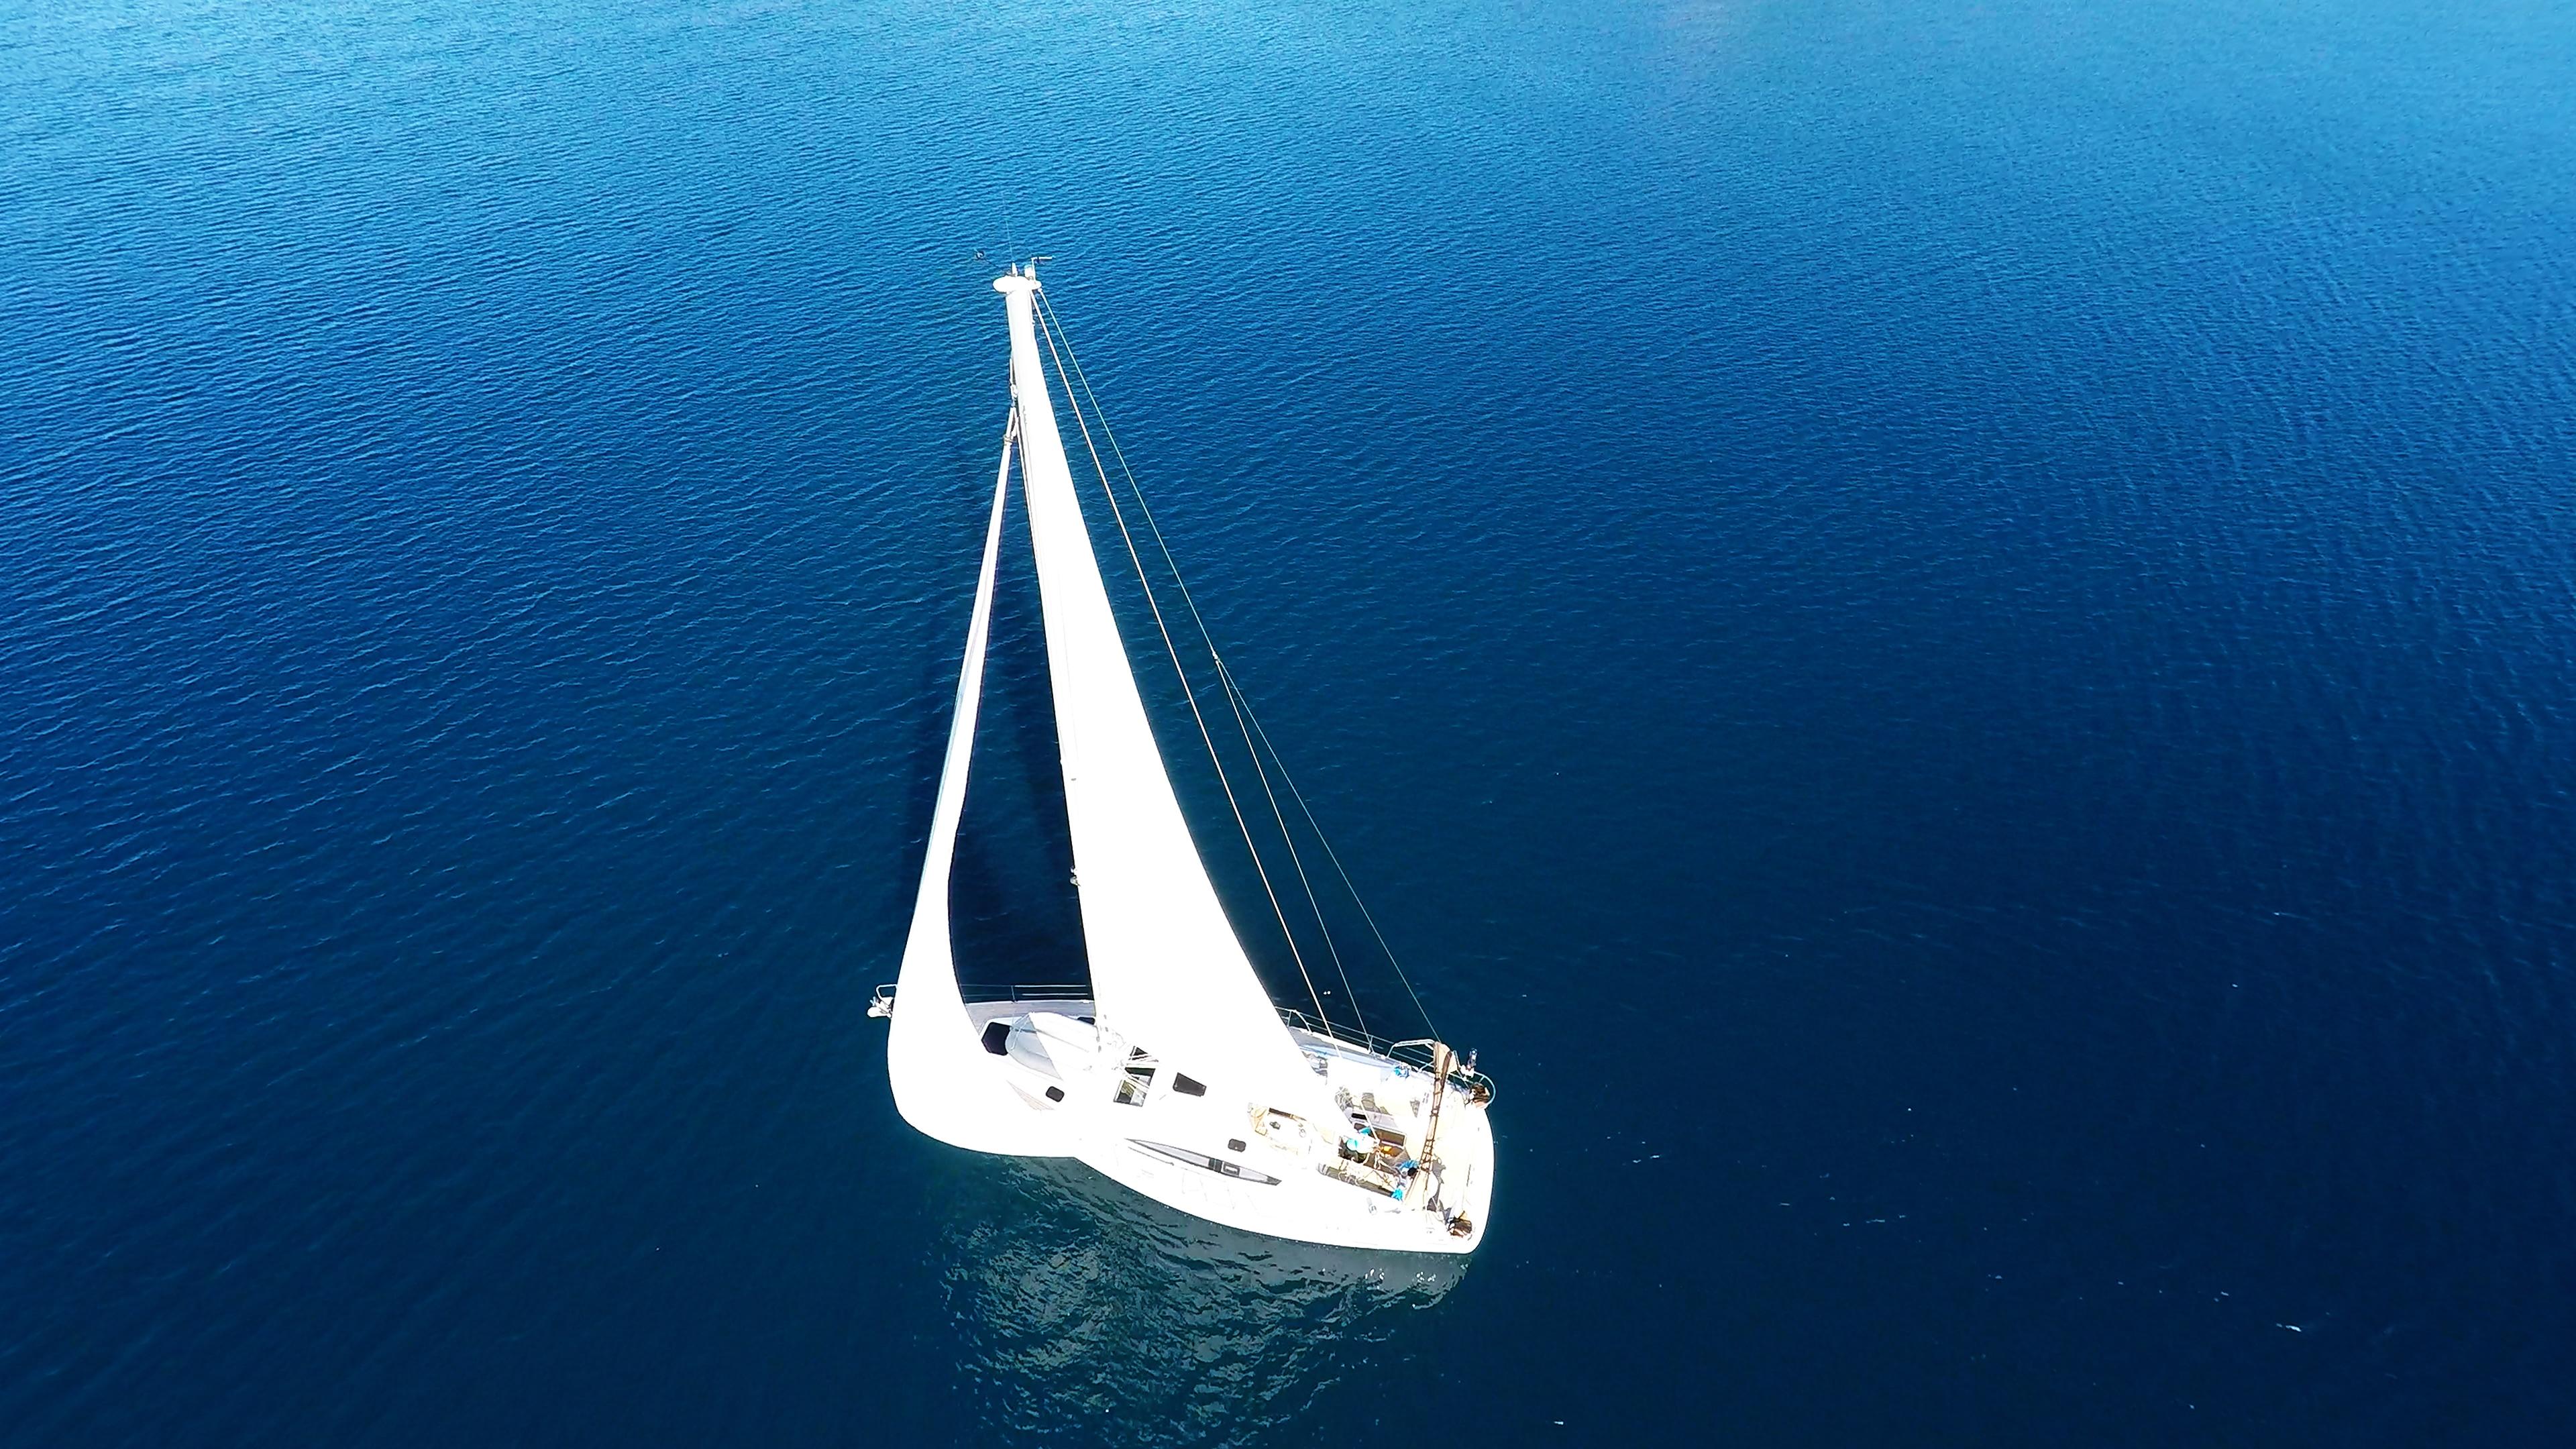 barcha a vela barca a vela mare blu soleggiato vele di yacht a vela